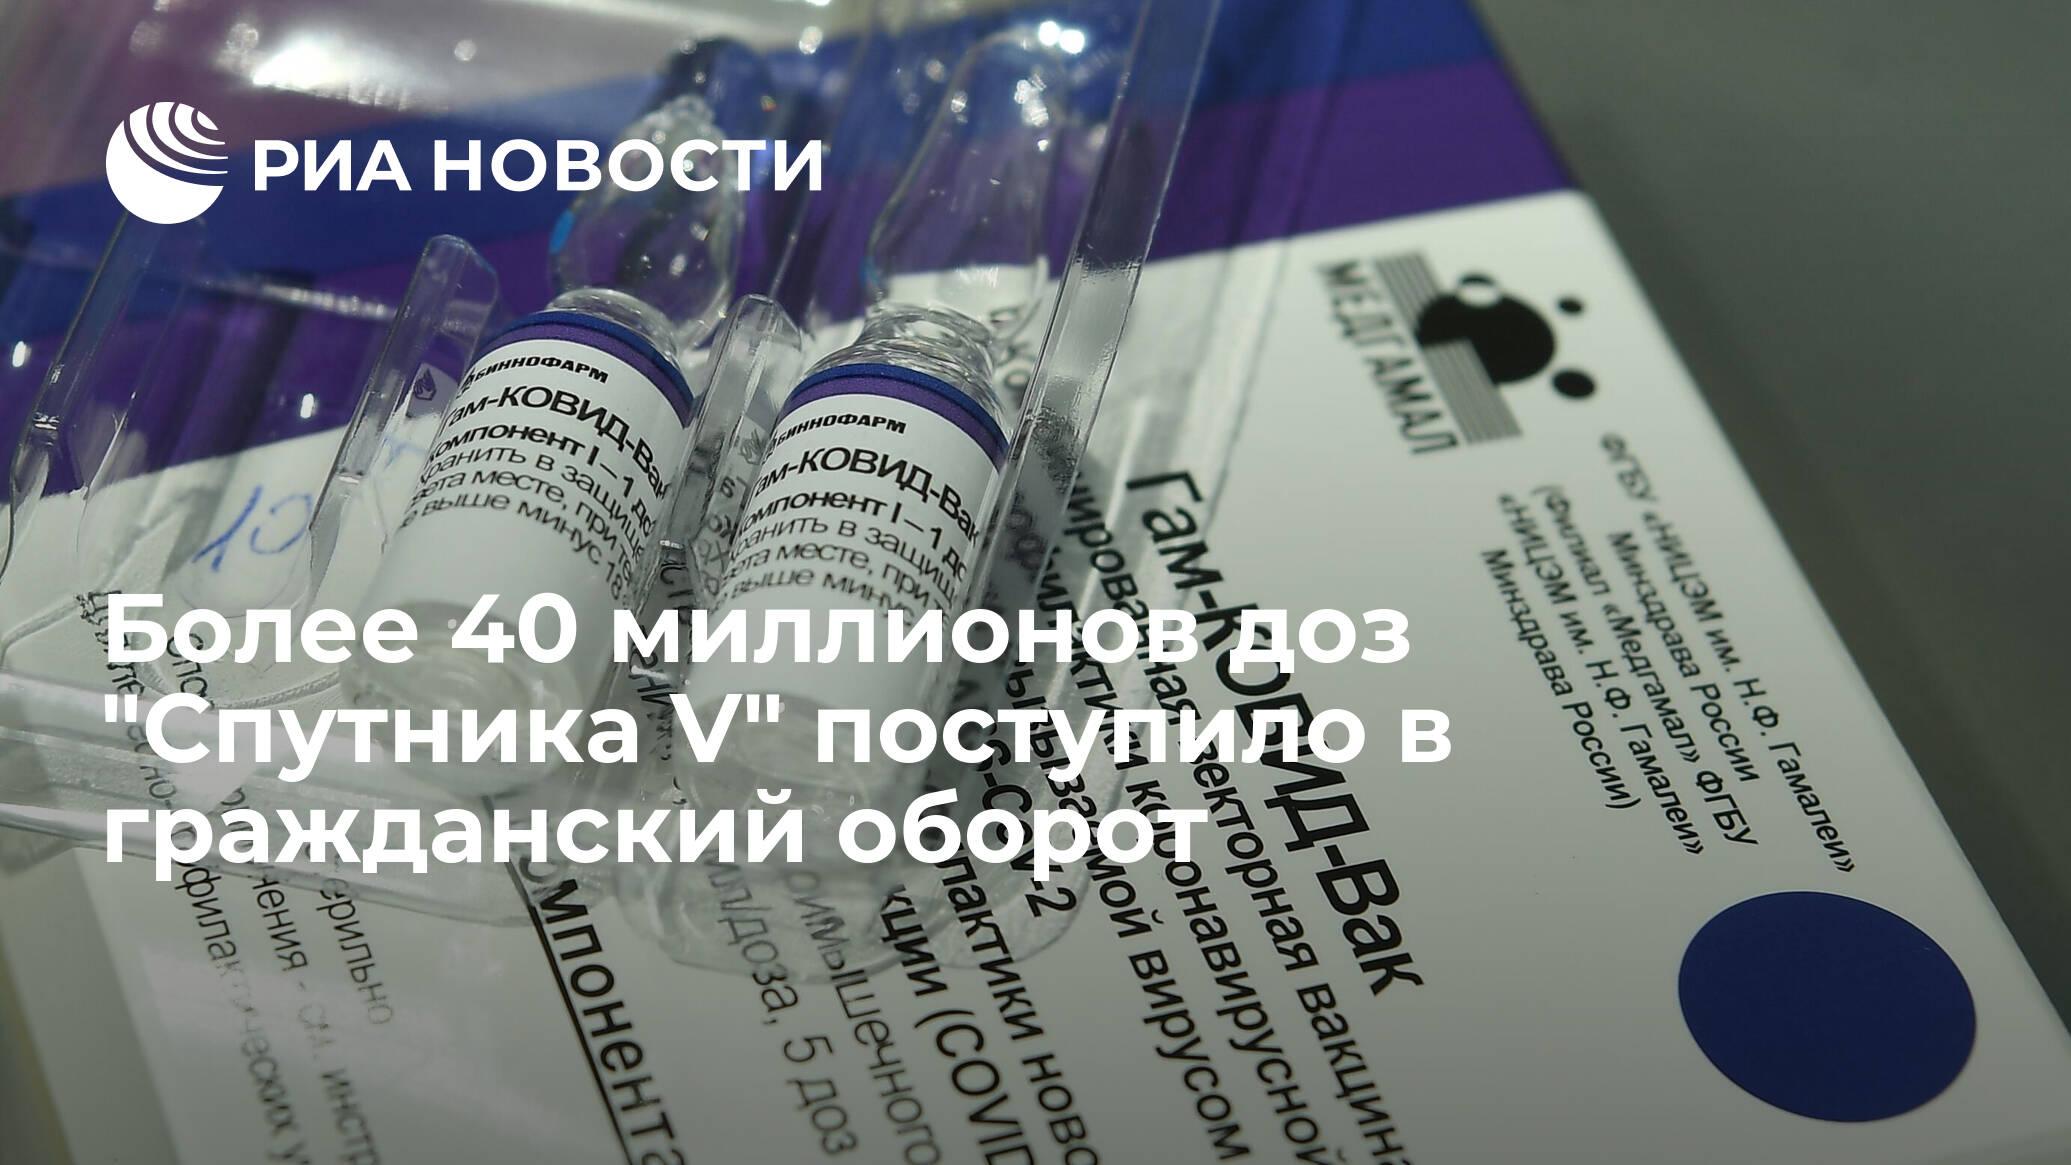 https://cdn21.img.ria.ru/images/sharing/article/1745290777.jpg?17400740481628665631